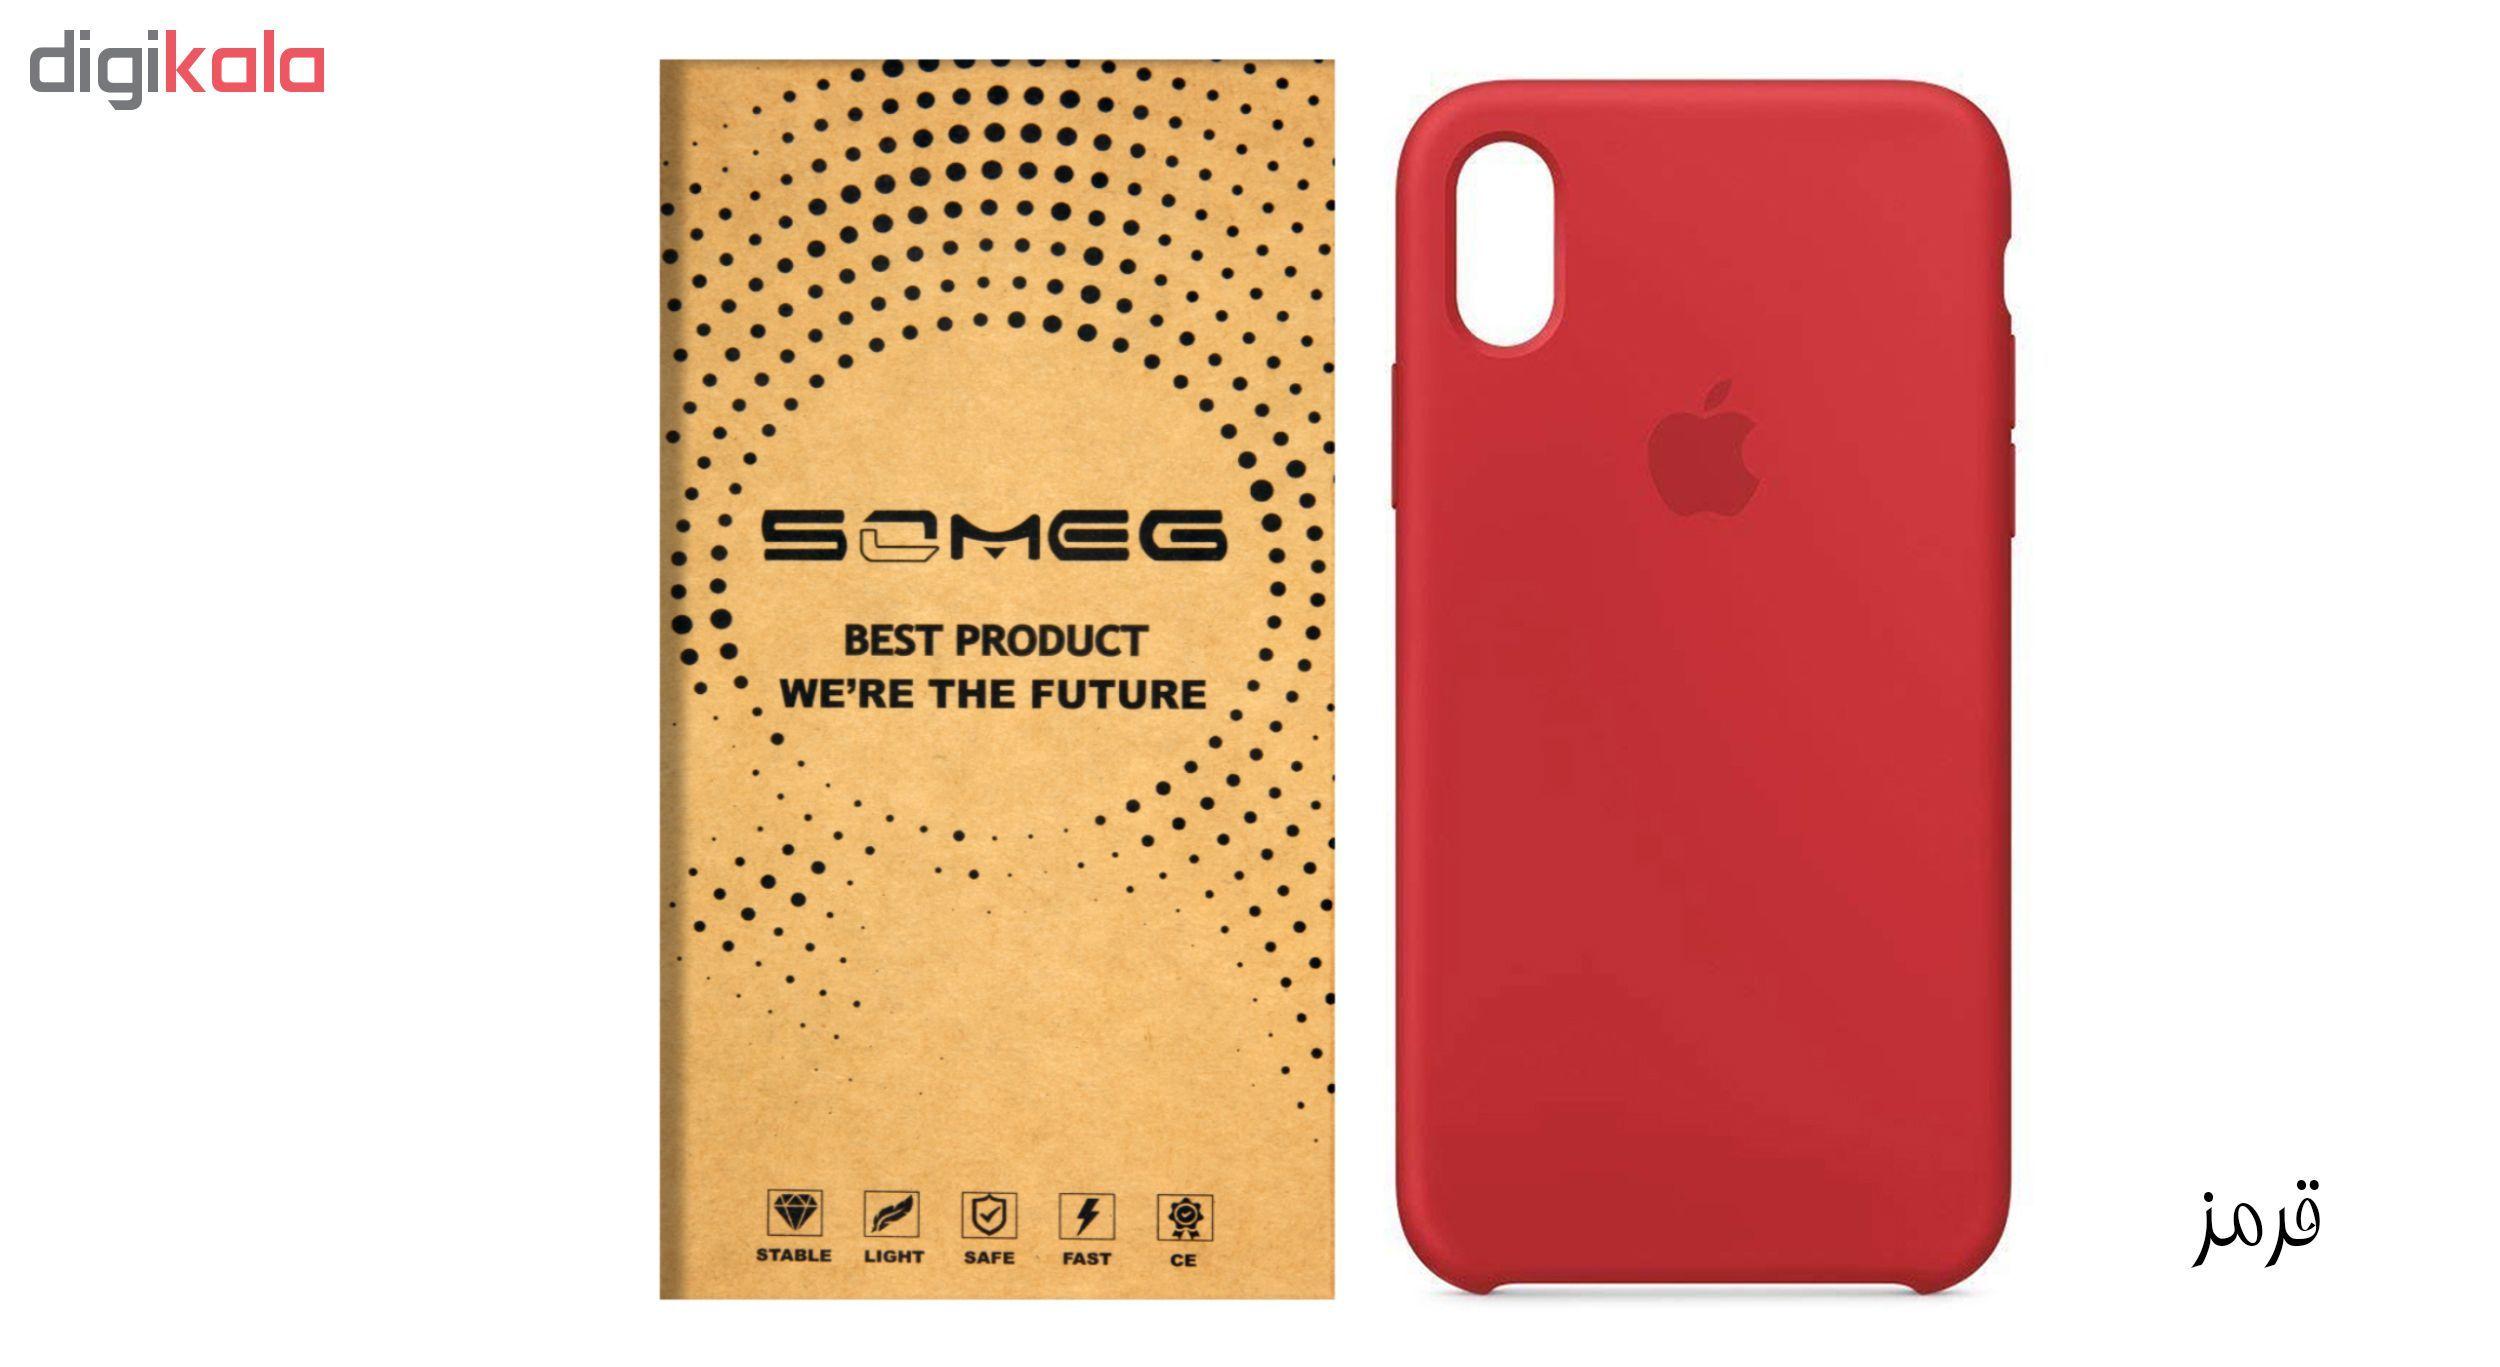 کاور سومگ مدل SIC مناسب برای گوشی موبایل اپل iPhone X  main 1 22